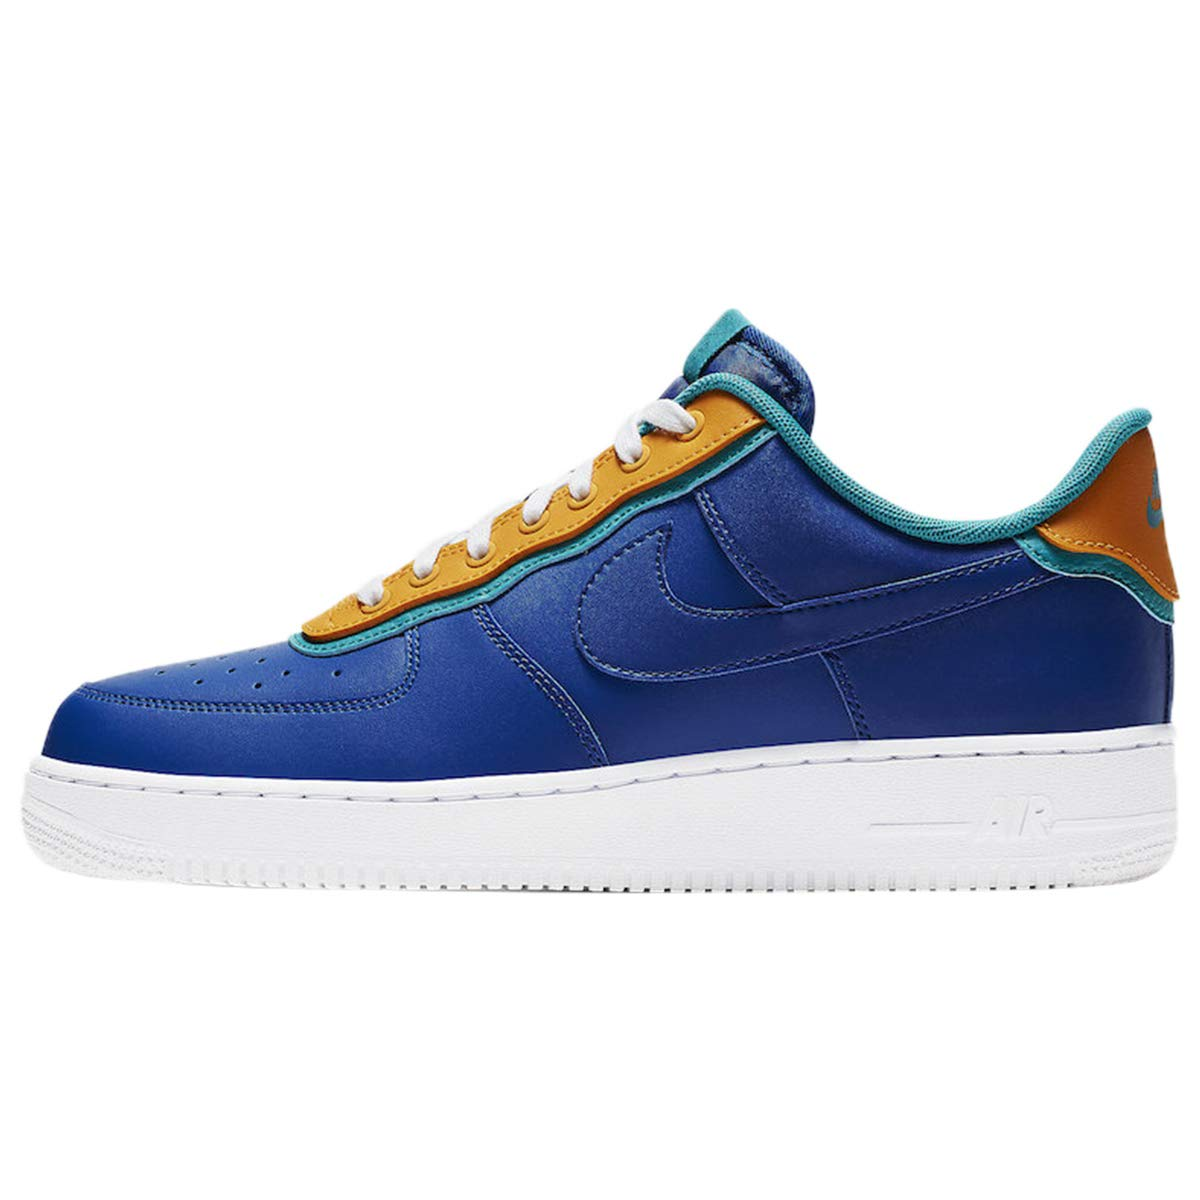 MultiCouleure (Indigo Force Indigo Force Canyon or 000) Nike Air Force 1 '07 Lv8 1, Chaussures de Basketball Homme 49.5 EU